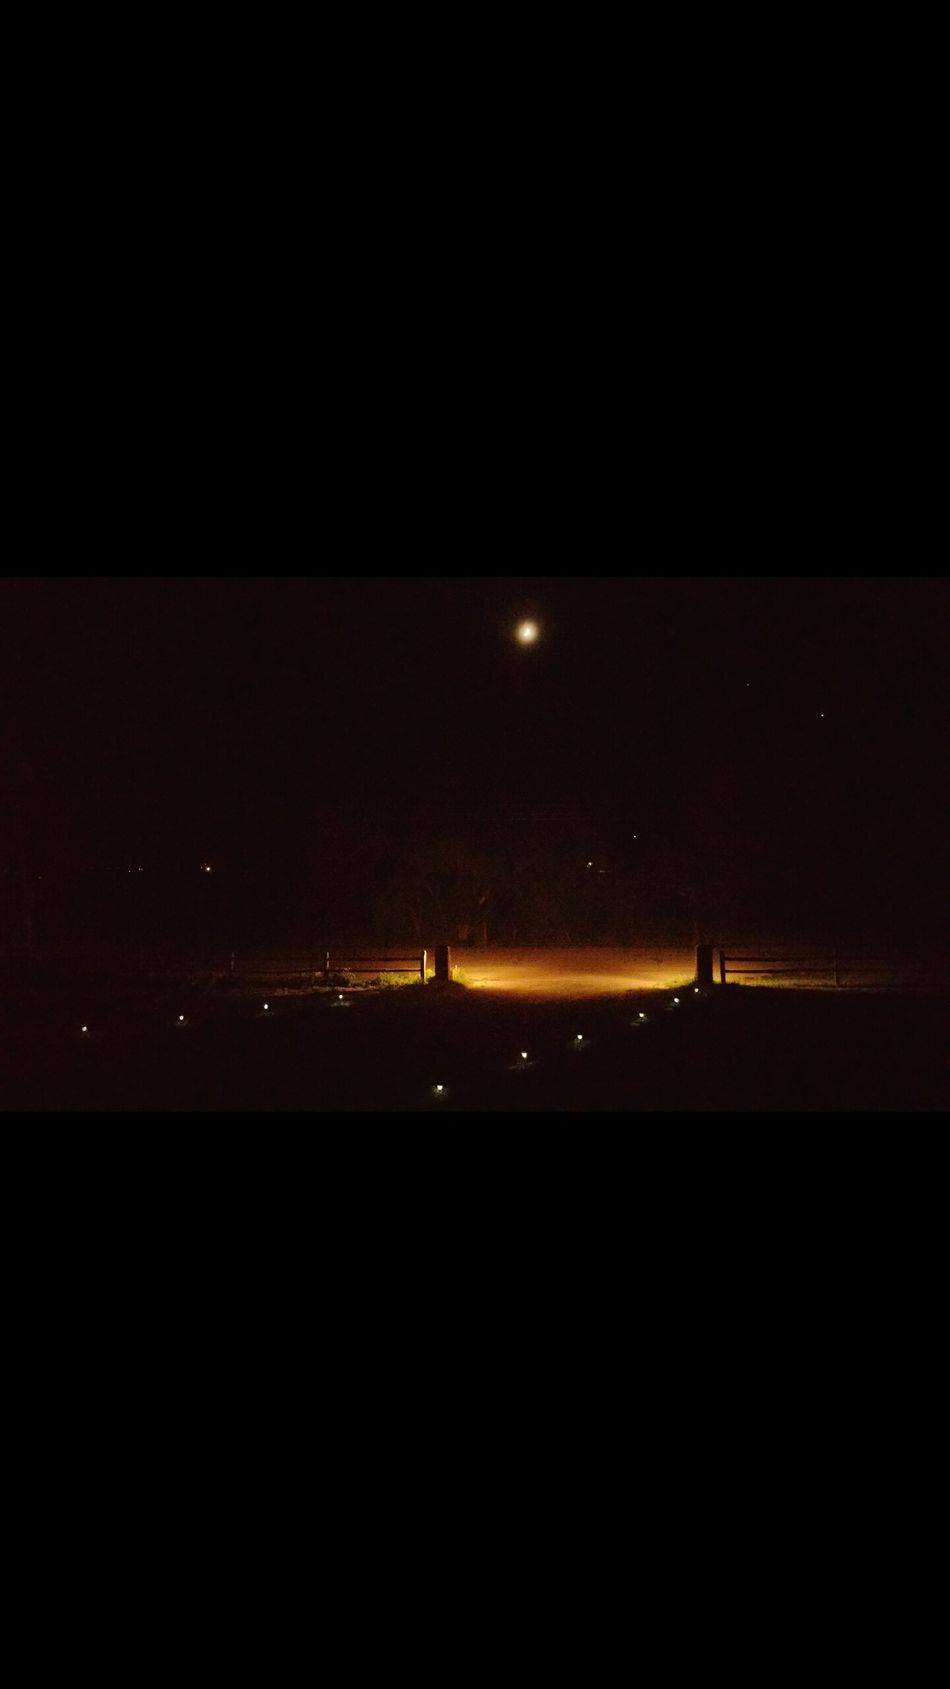 Night Drive Way Moon lights Trees Fence Road